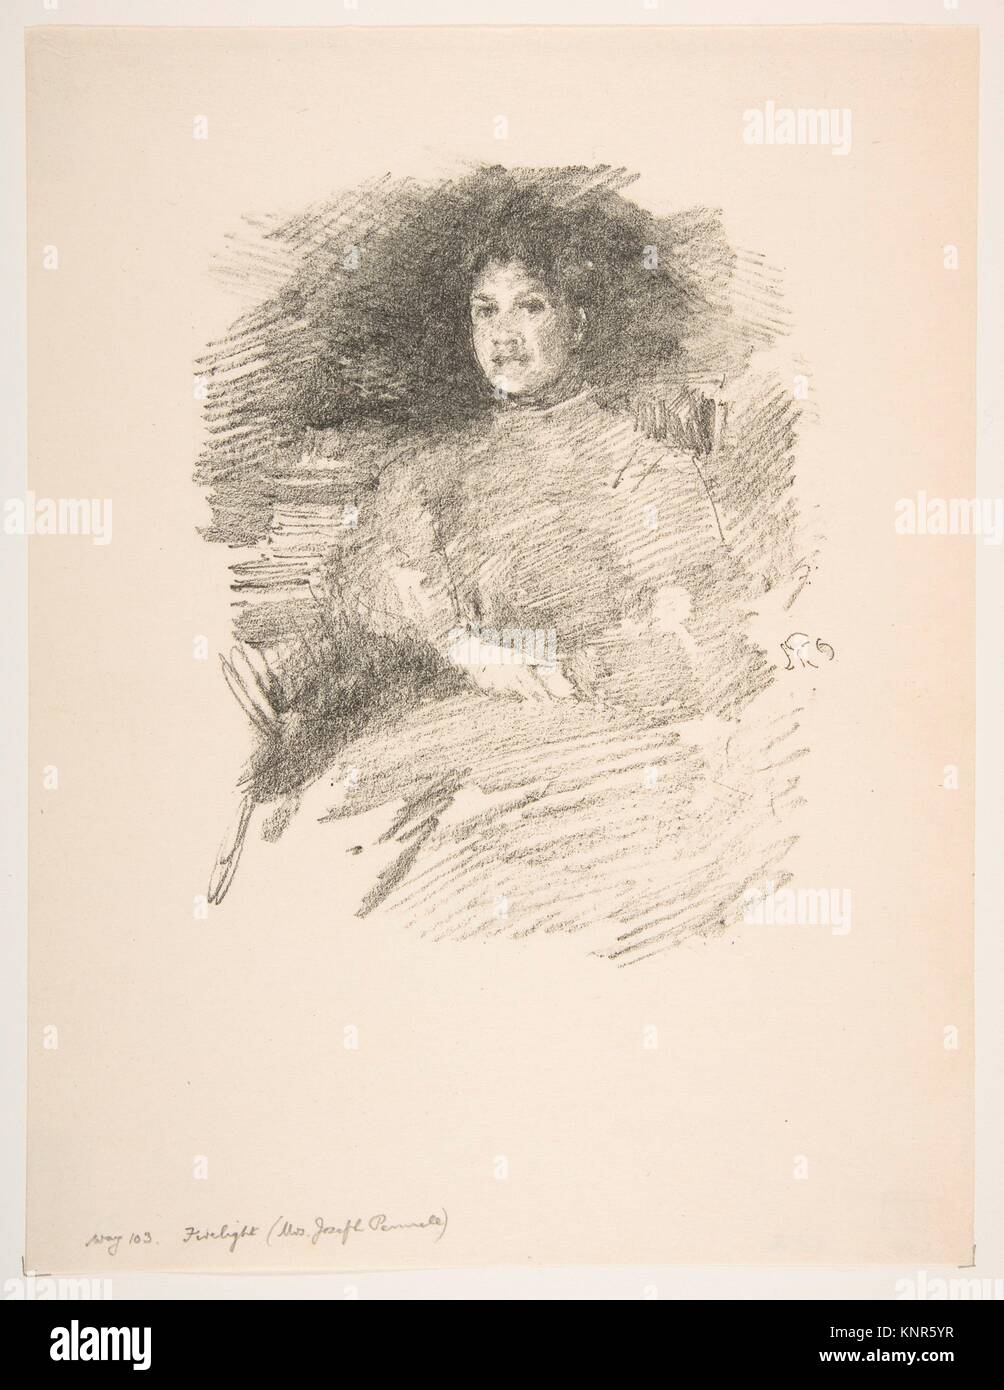 Firelight (Mrs. Joseph Pennell). Artist: James McNeill Whistler (American, Lowell, Massachusetts 1834-1903 London); - Stock Image